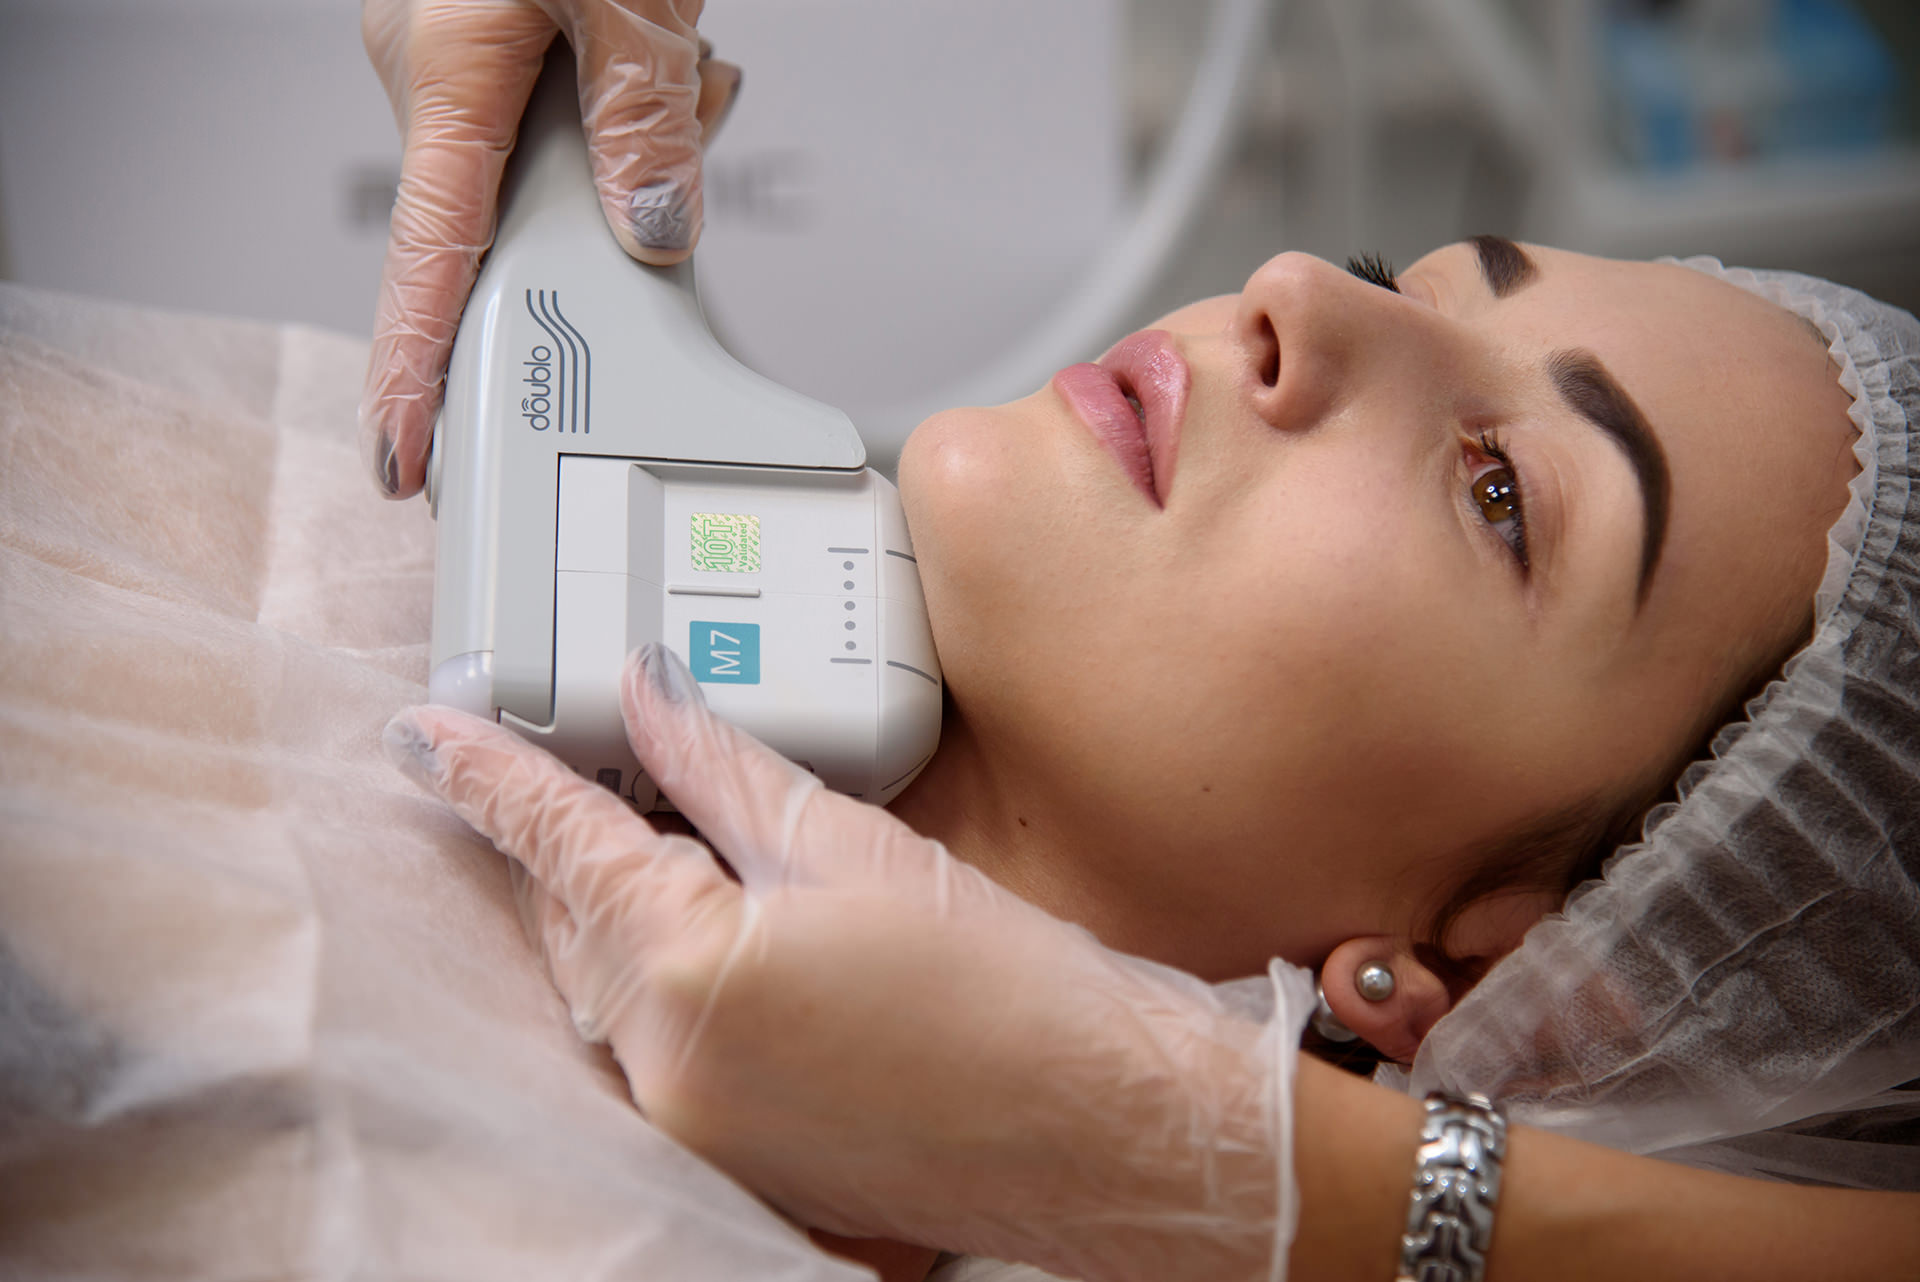 Smas-лифтинг на аппарате doublo system: как проводится процедура